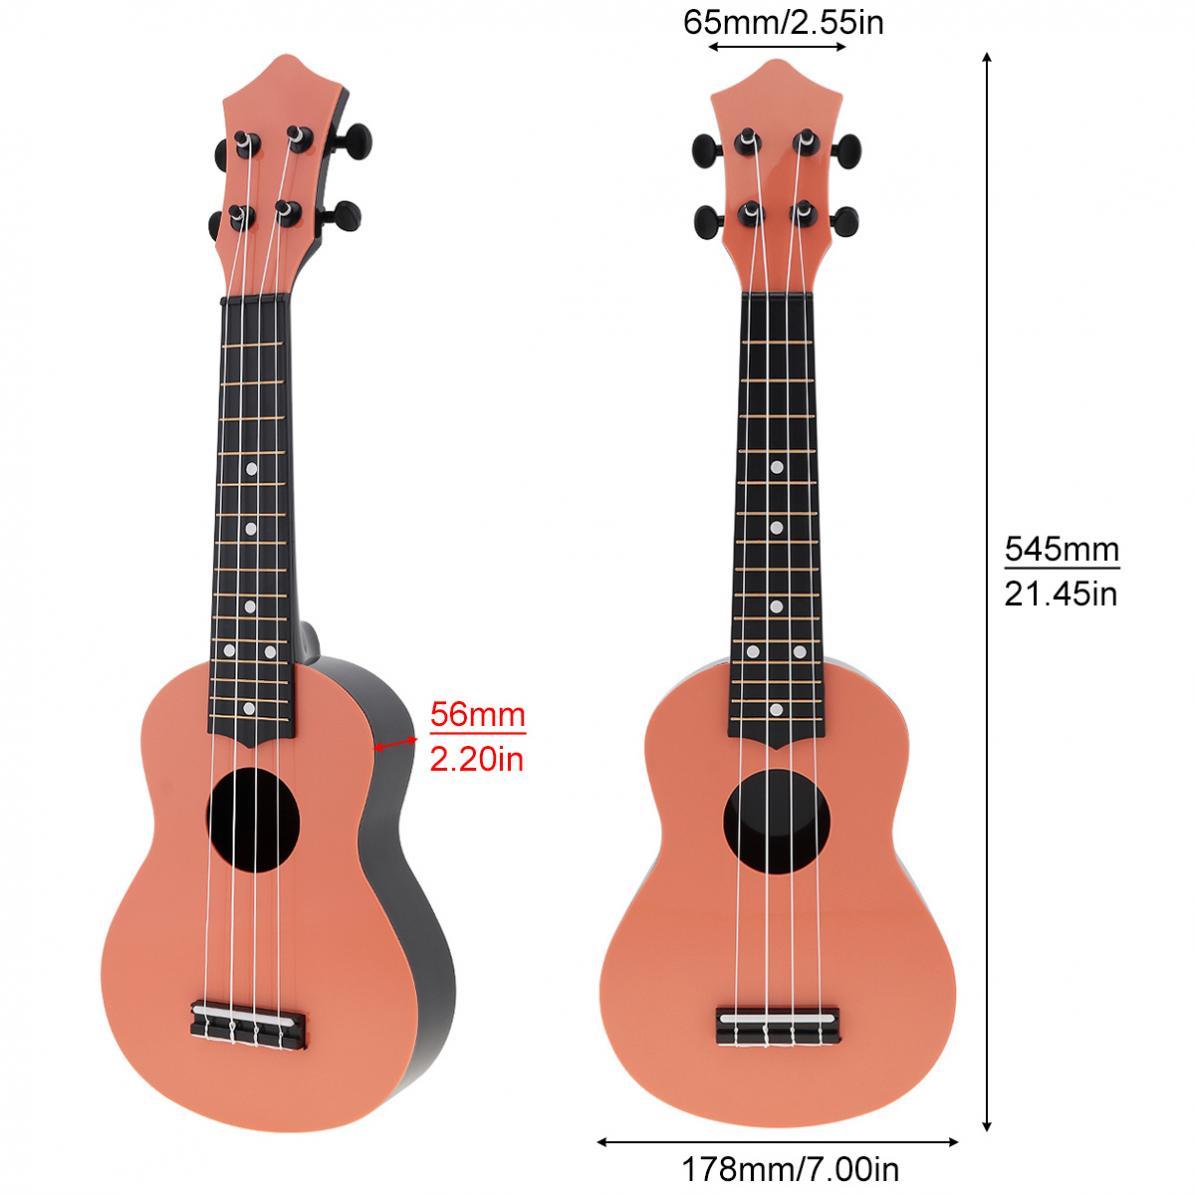 Ukulele 21 Inch Soprano Ukulele Colorful Plastic Acoustic 4 Strings Hawaii Guitar Instrument for Children and Music Beginner enlarge